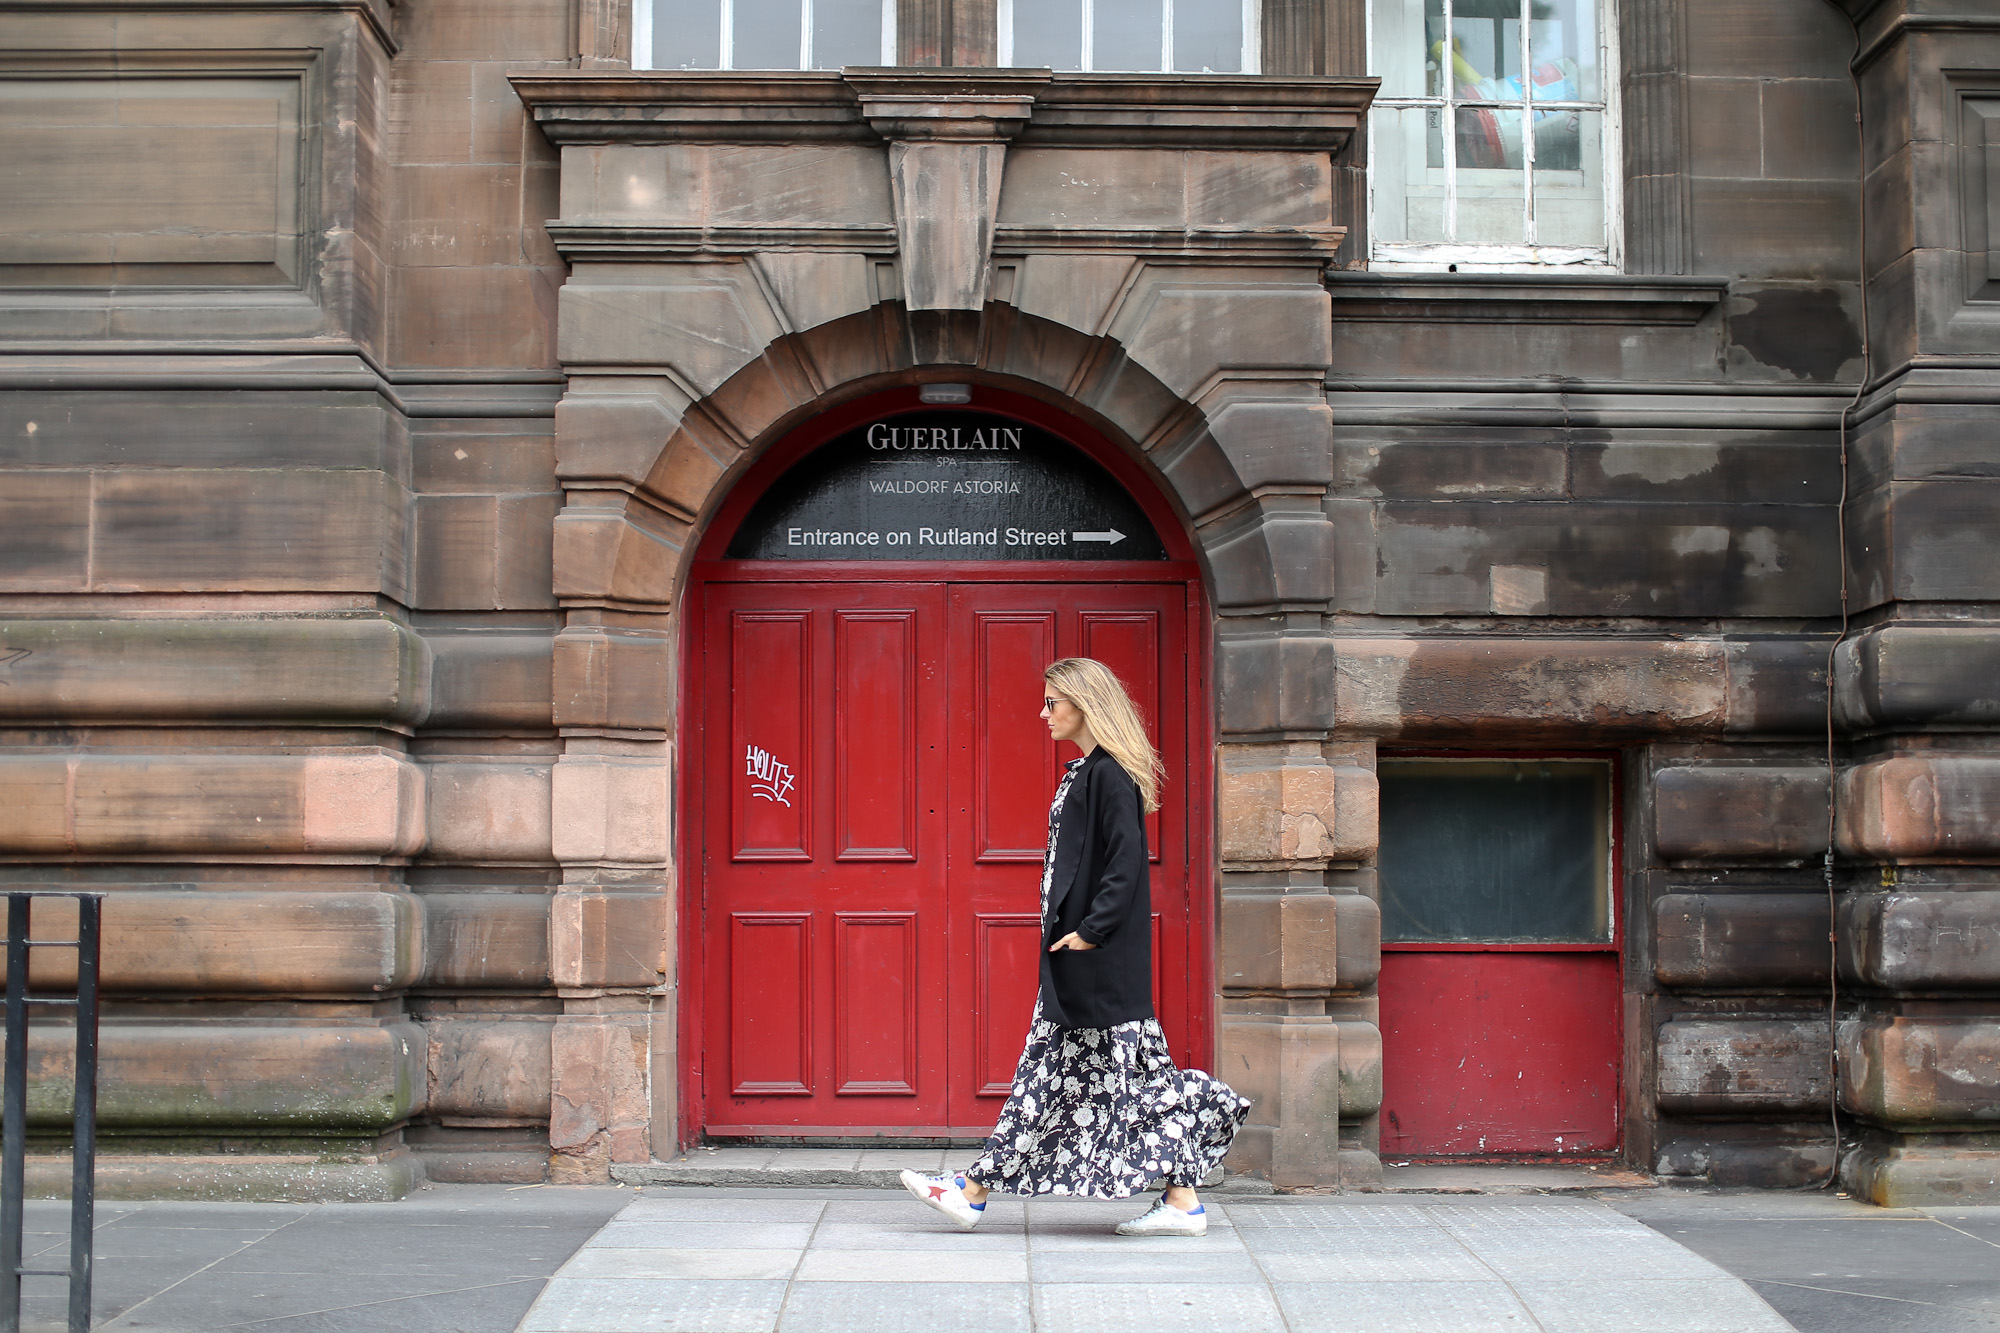 Clochet_streetstyle_edinburgh_igerswindtrip_escociamola_zaralongflowerprintdress_goldengoosedeluxe_sneakers-2